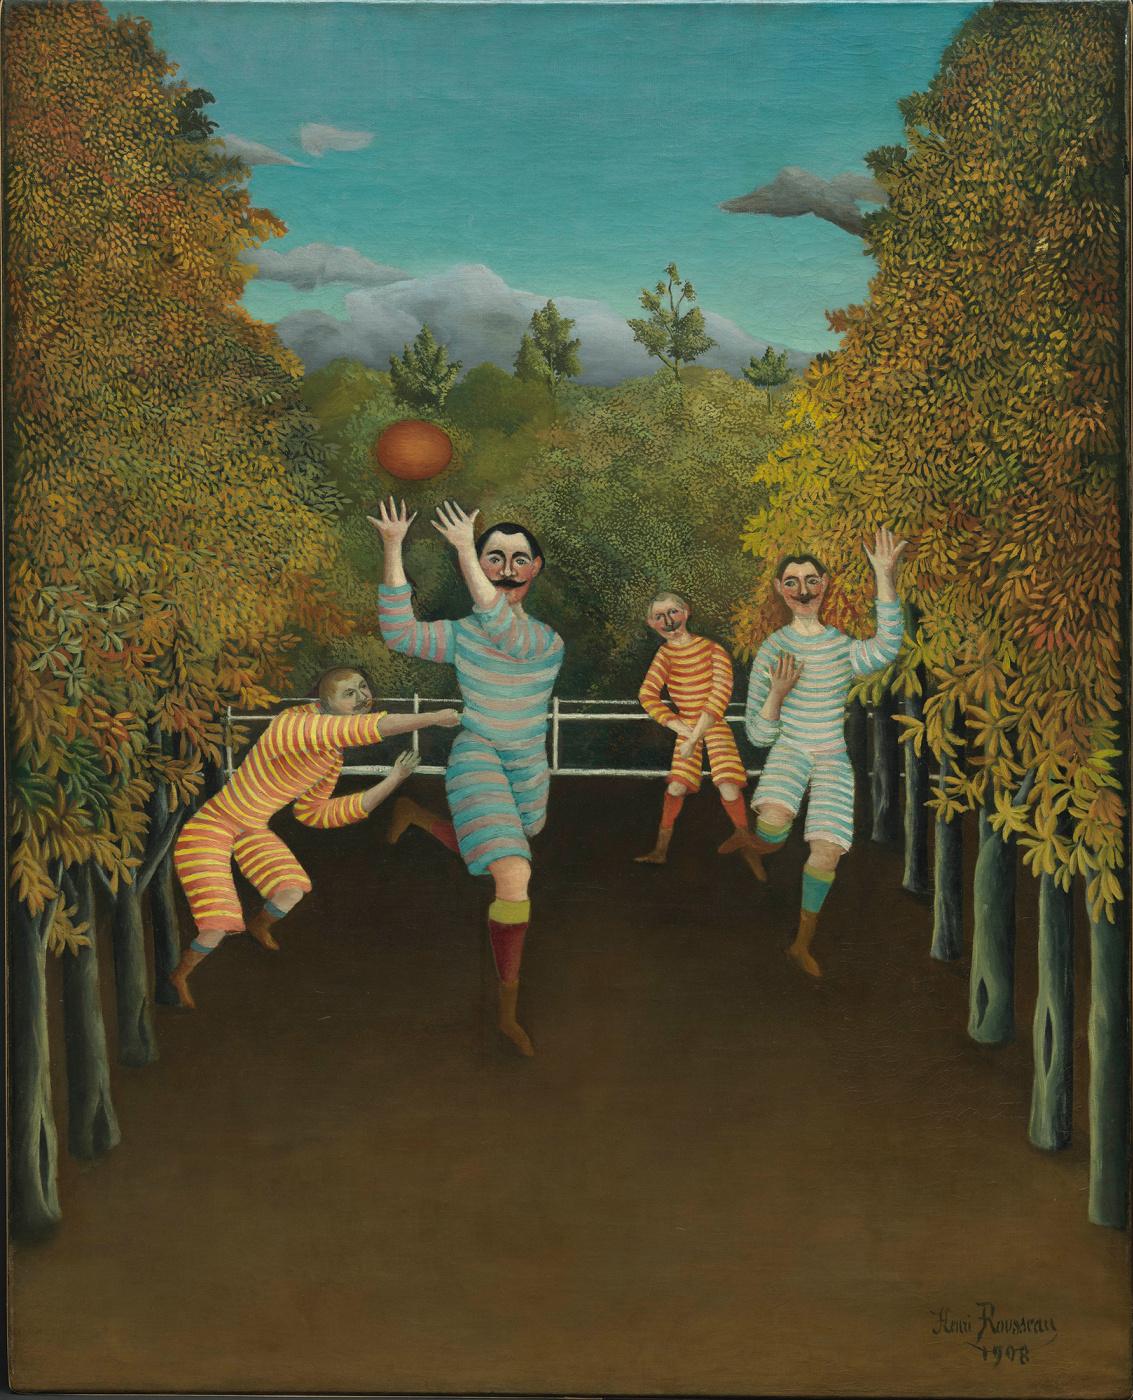 Henri Rousseau. Soccer players